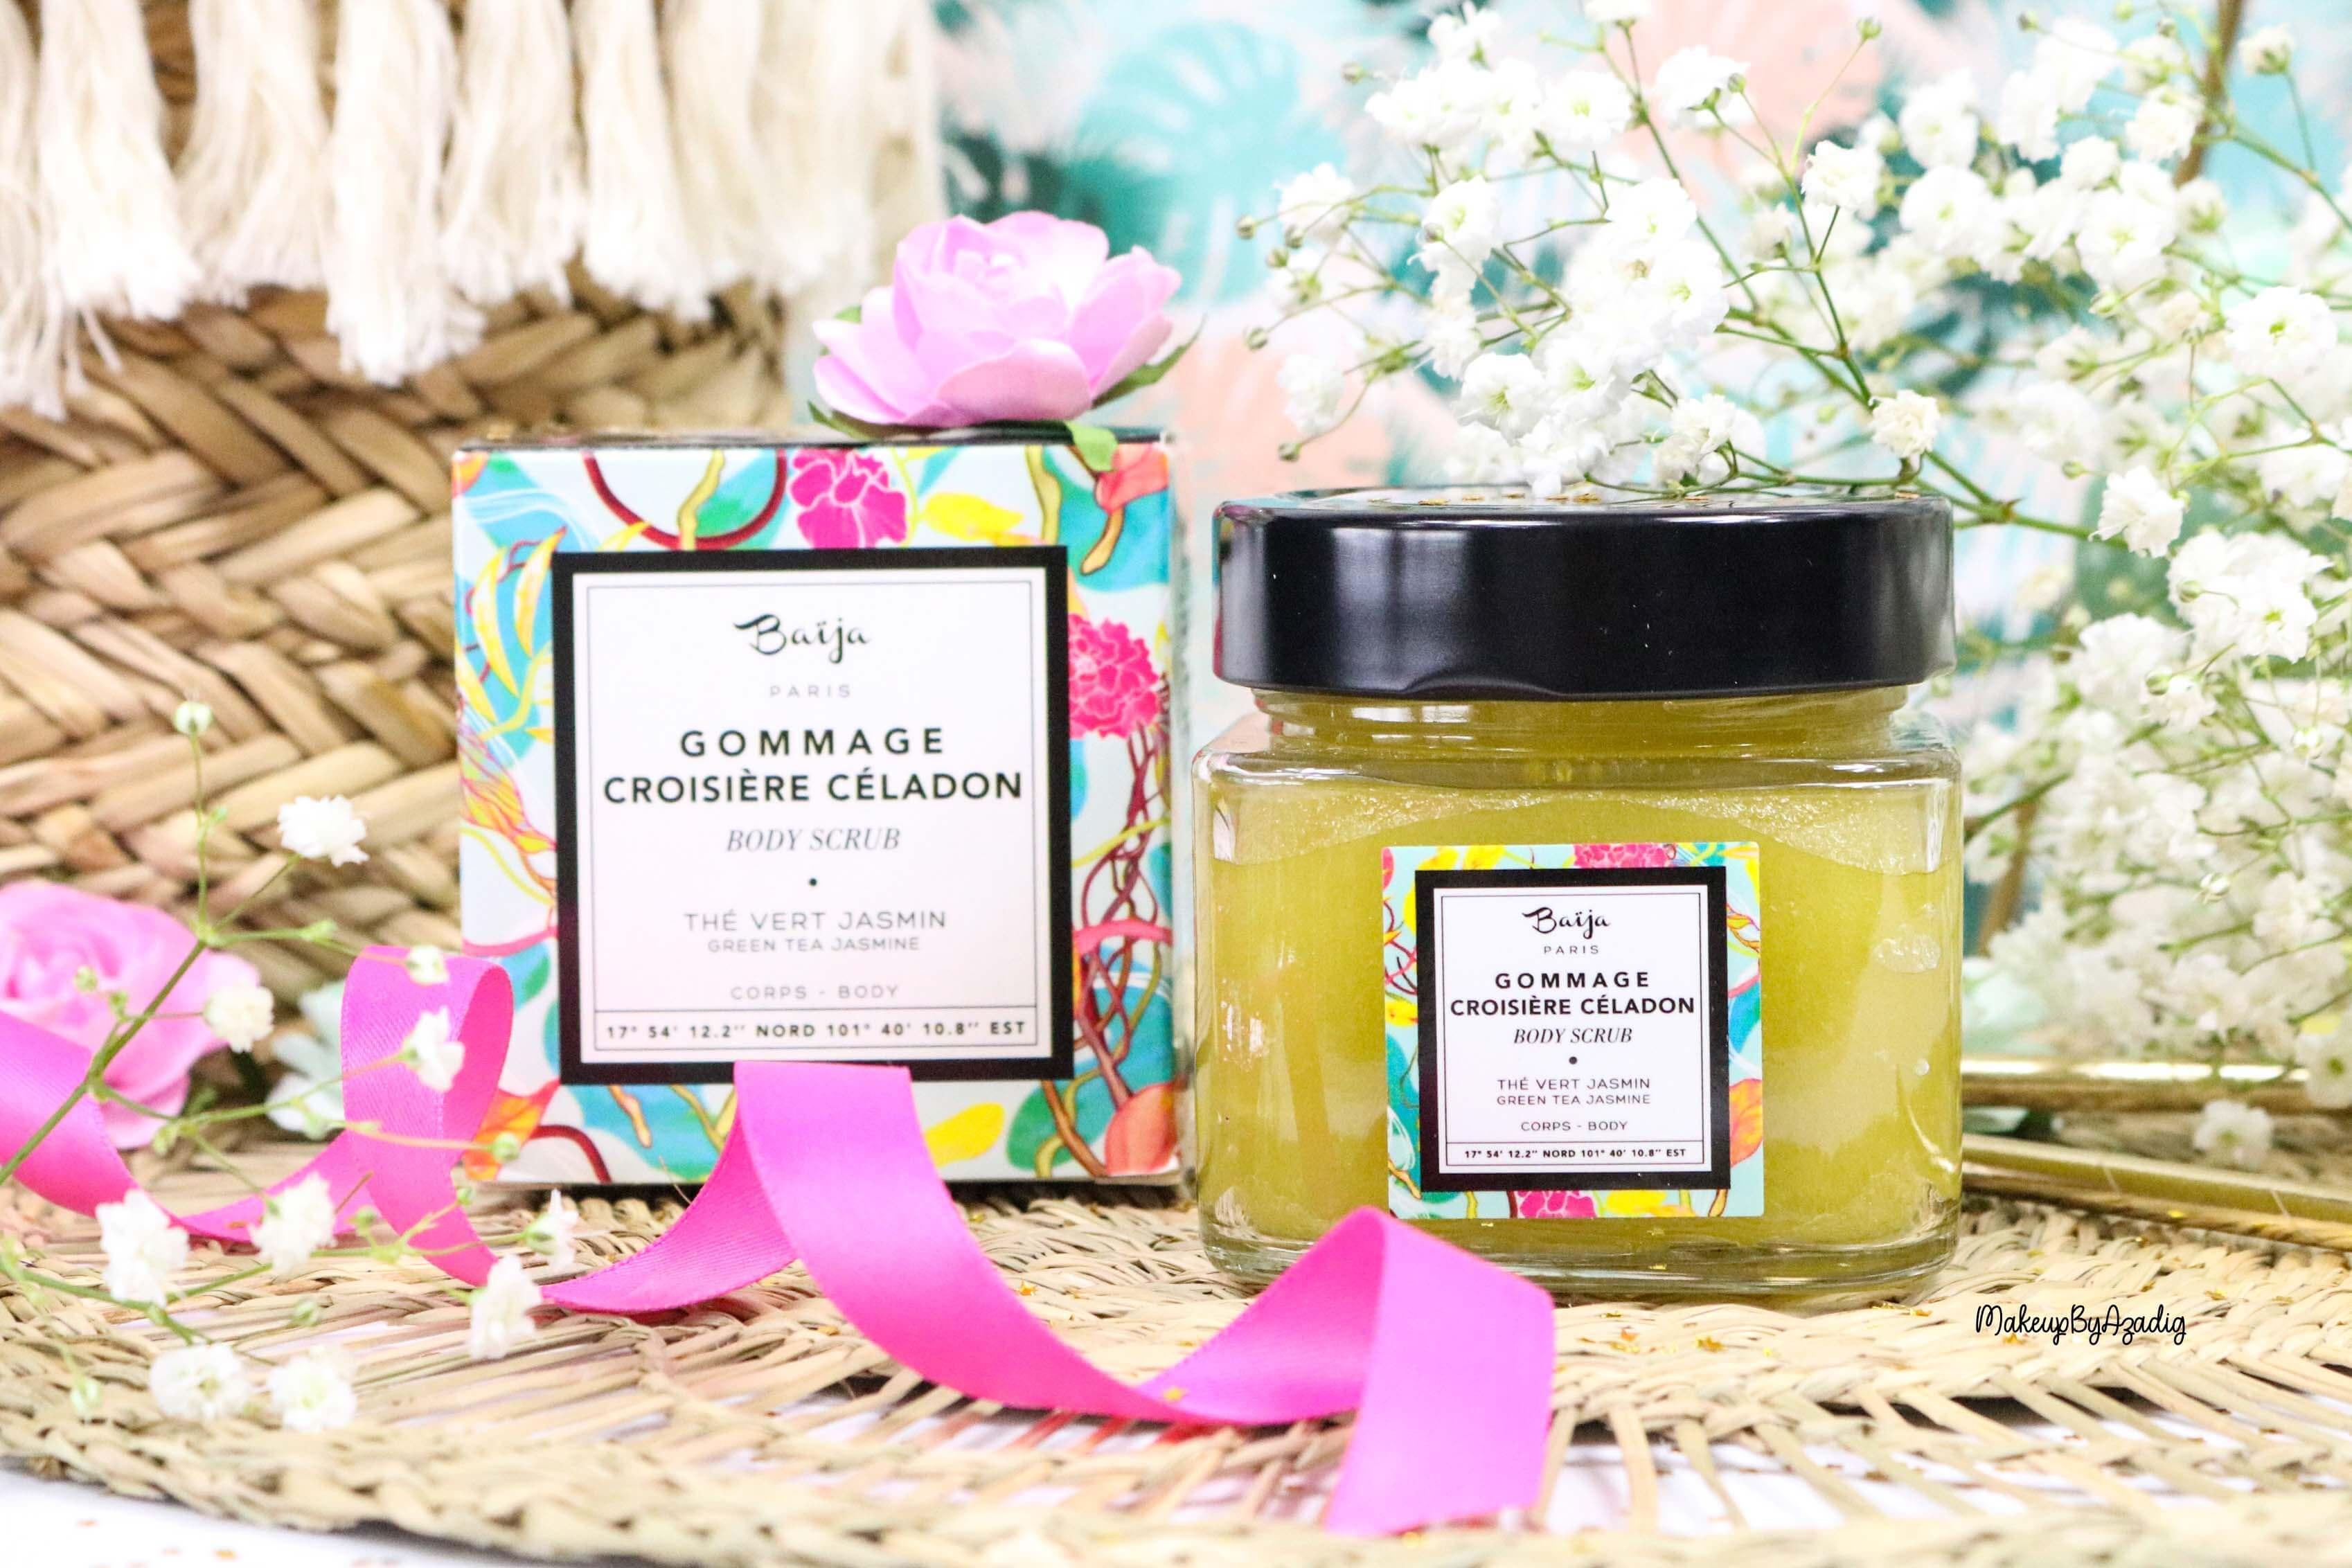 revue-gommage-corps-doux-croisiere-celadon-baija-thevert-jasmin-sephora-avis-prix-madeinfrance-makeupbyazadig-miniature